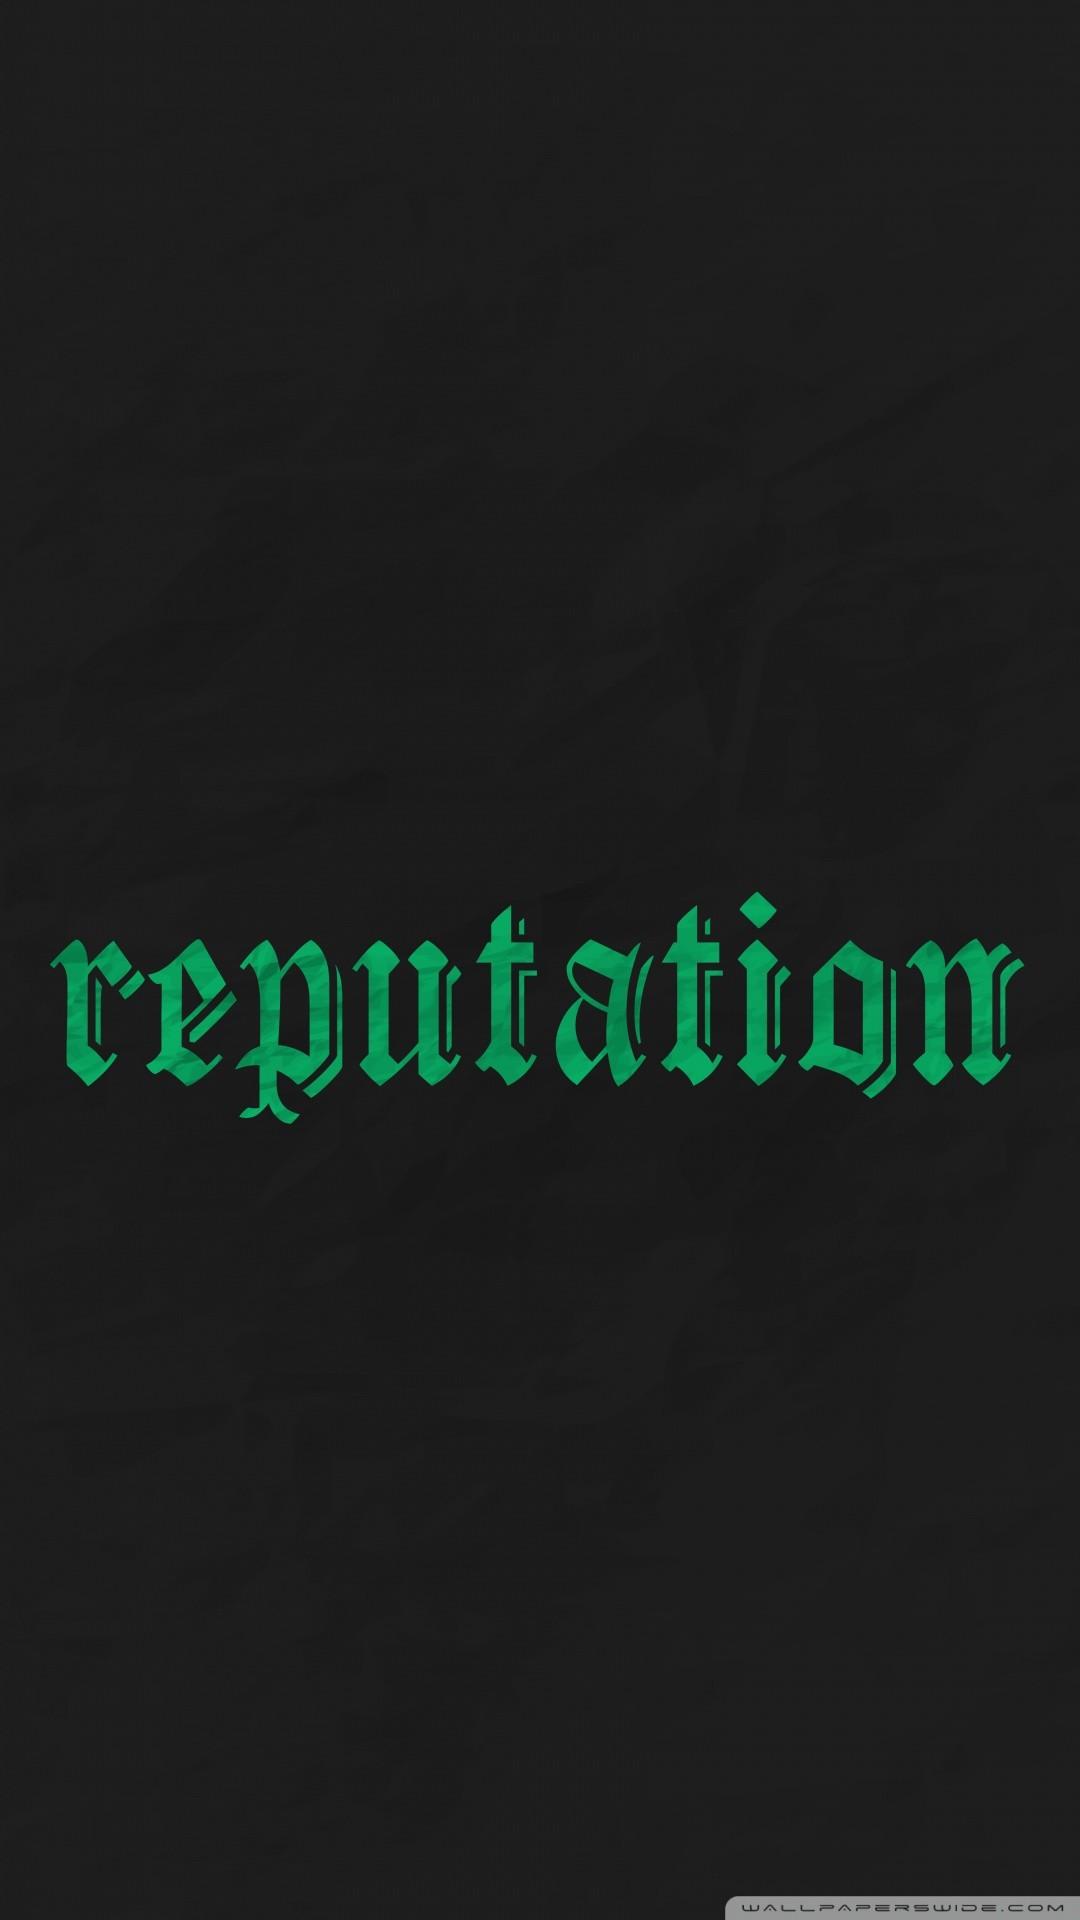 Free Reputation phone wallpaper by hrummy7